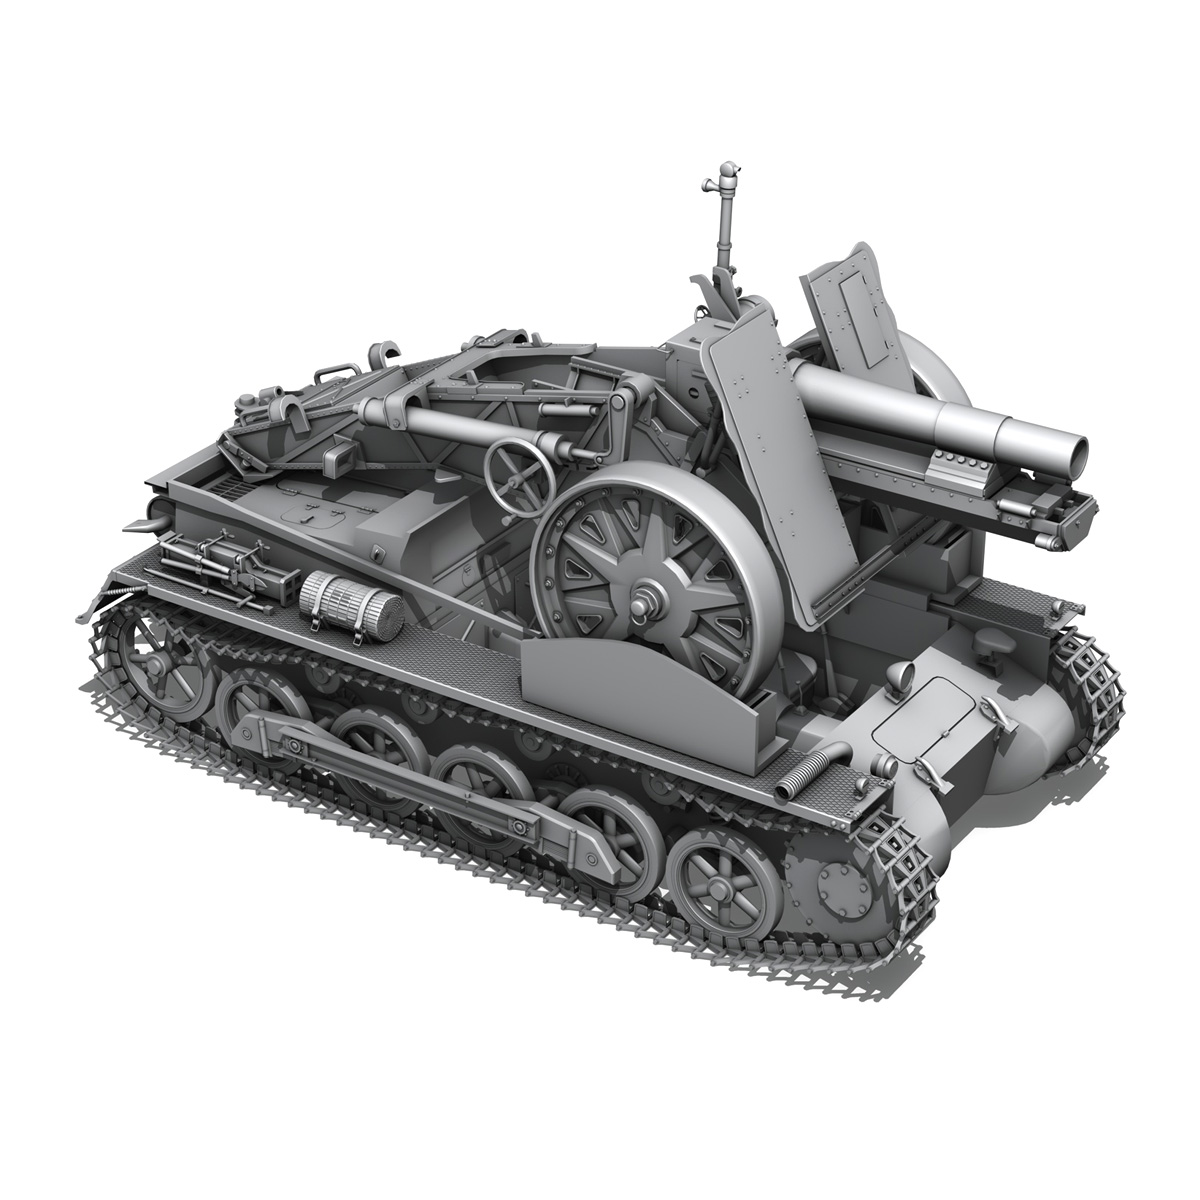 sd.kfz 101 – sturmpanzer 1 – bison 3d model 3ds fbx c4d lwo obj 189276